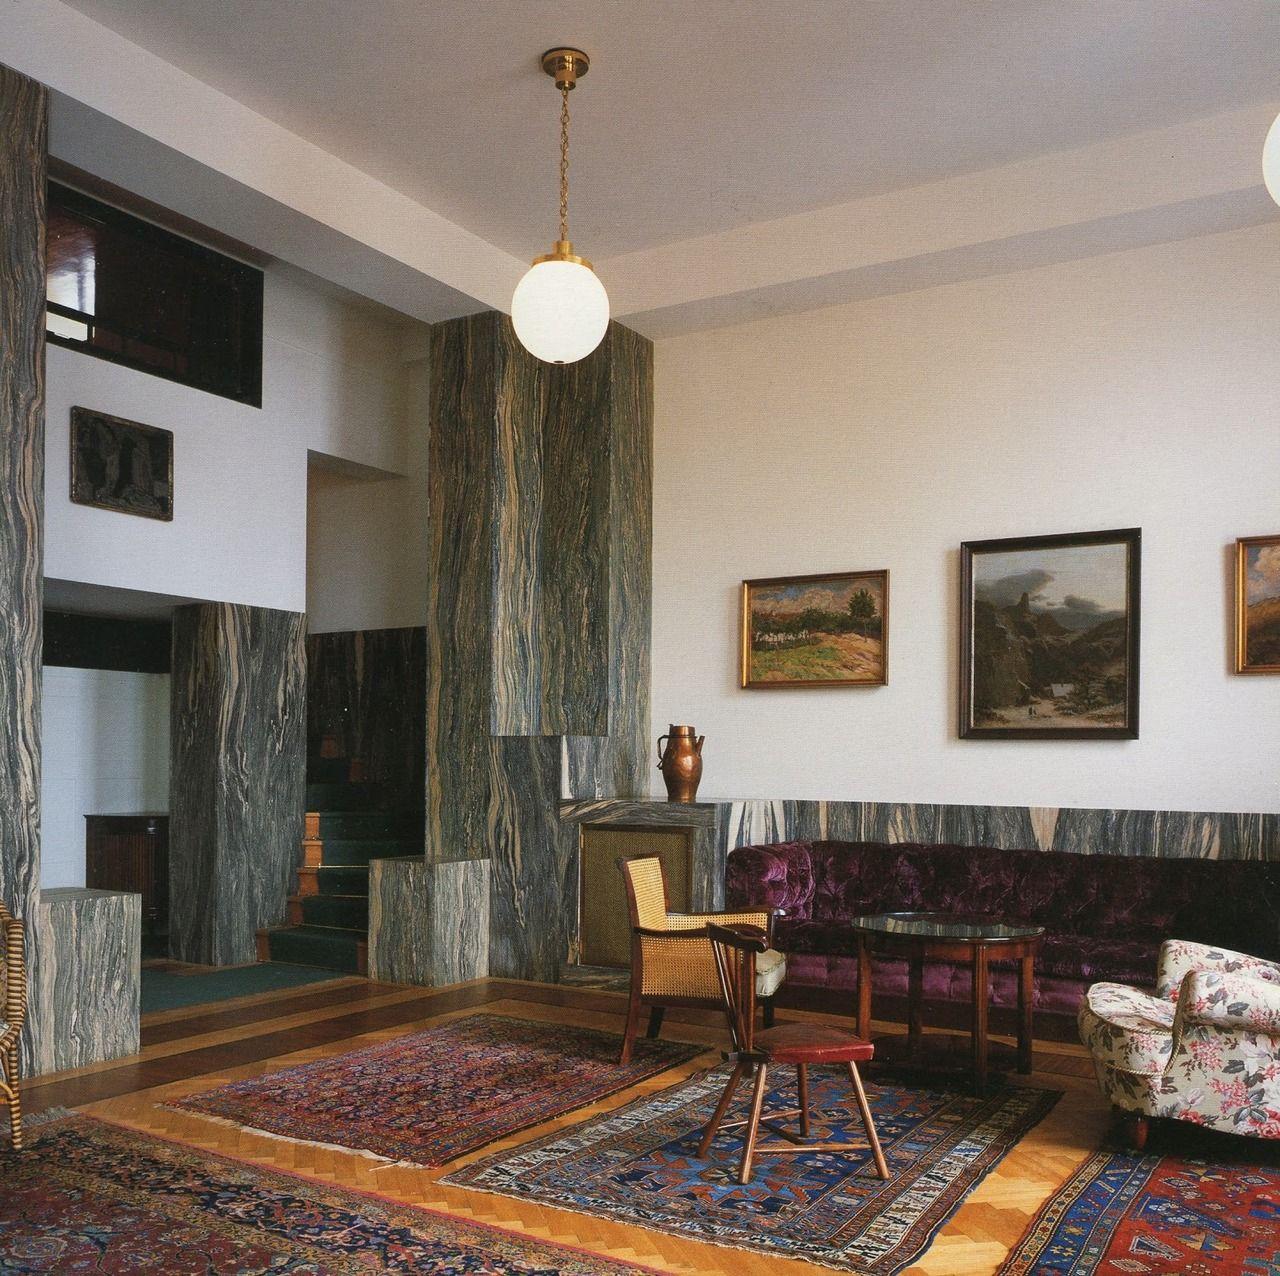 Antique Mediterranean Homes Interior Design Architecture: Adolf Loos, Villa Müller